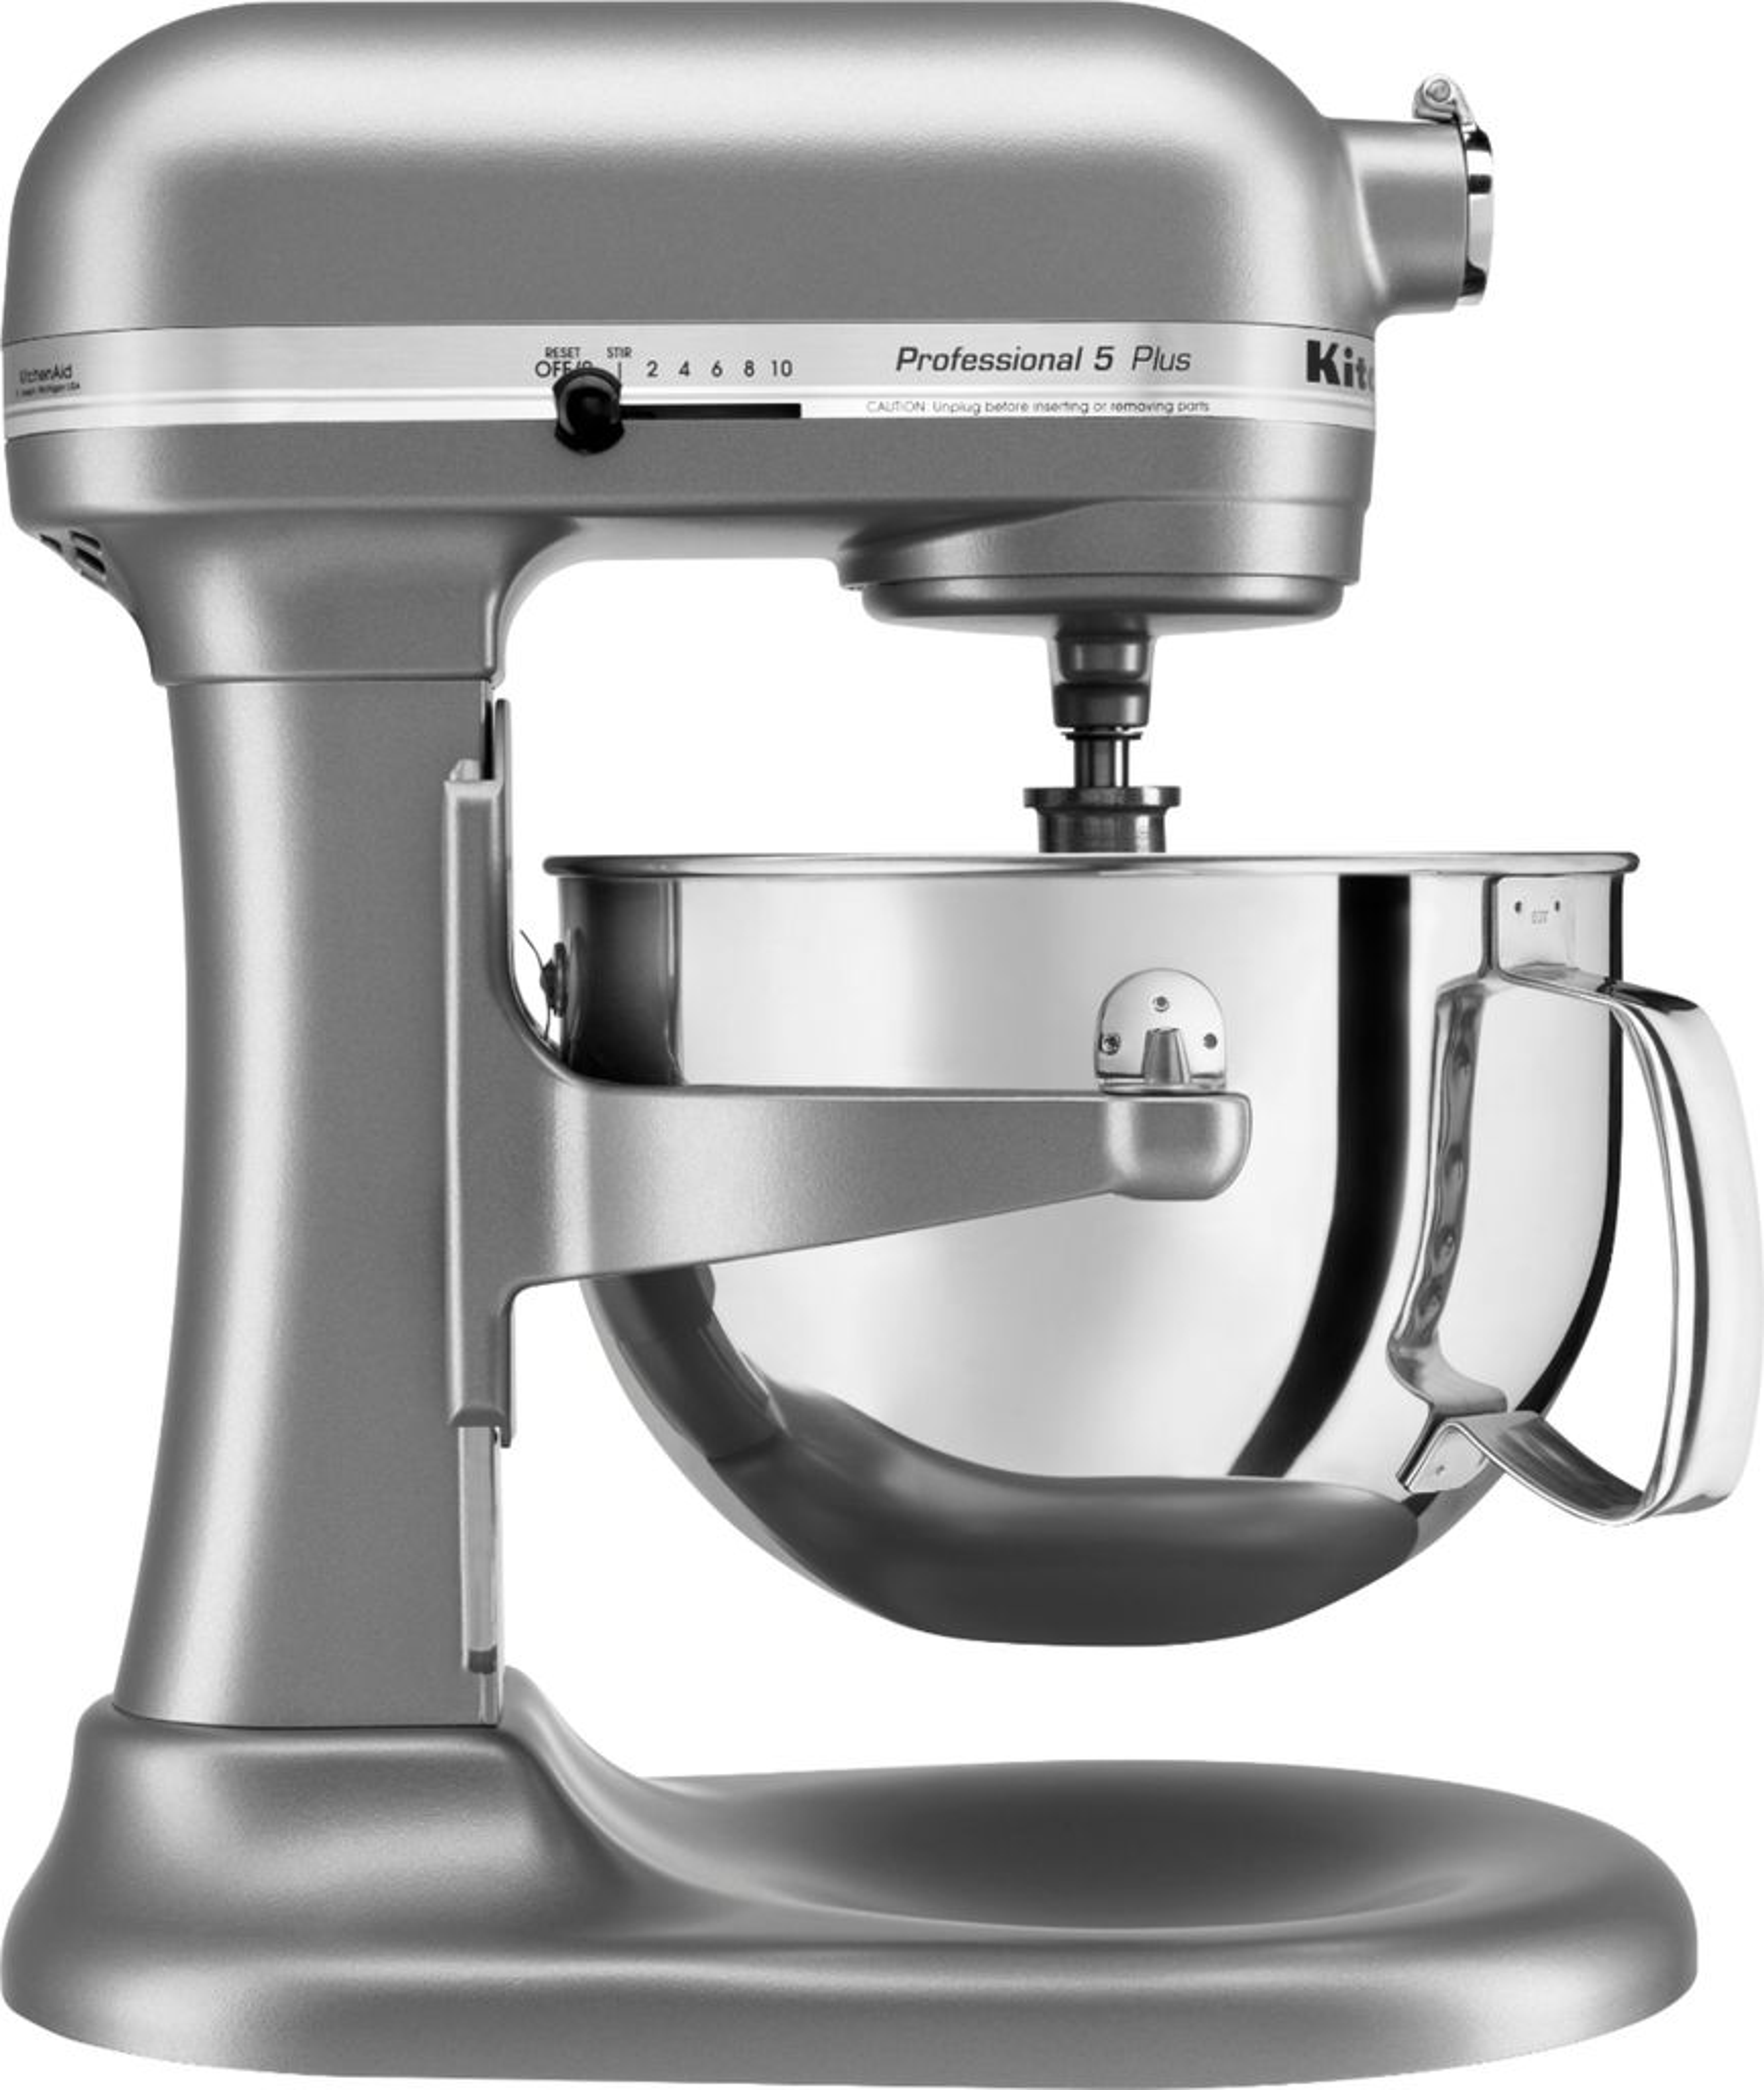 KitchenAid - Professional 5 Plus Series Bowl-Lift Stand Mixer - Silver